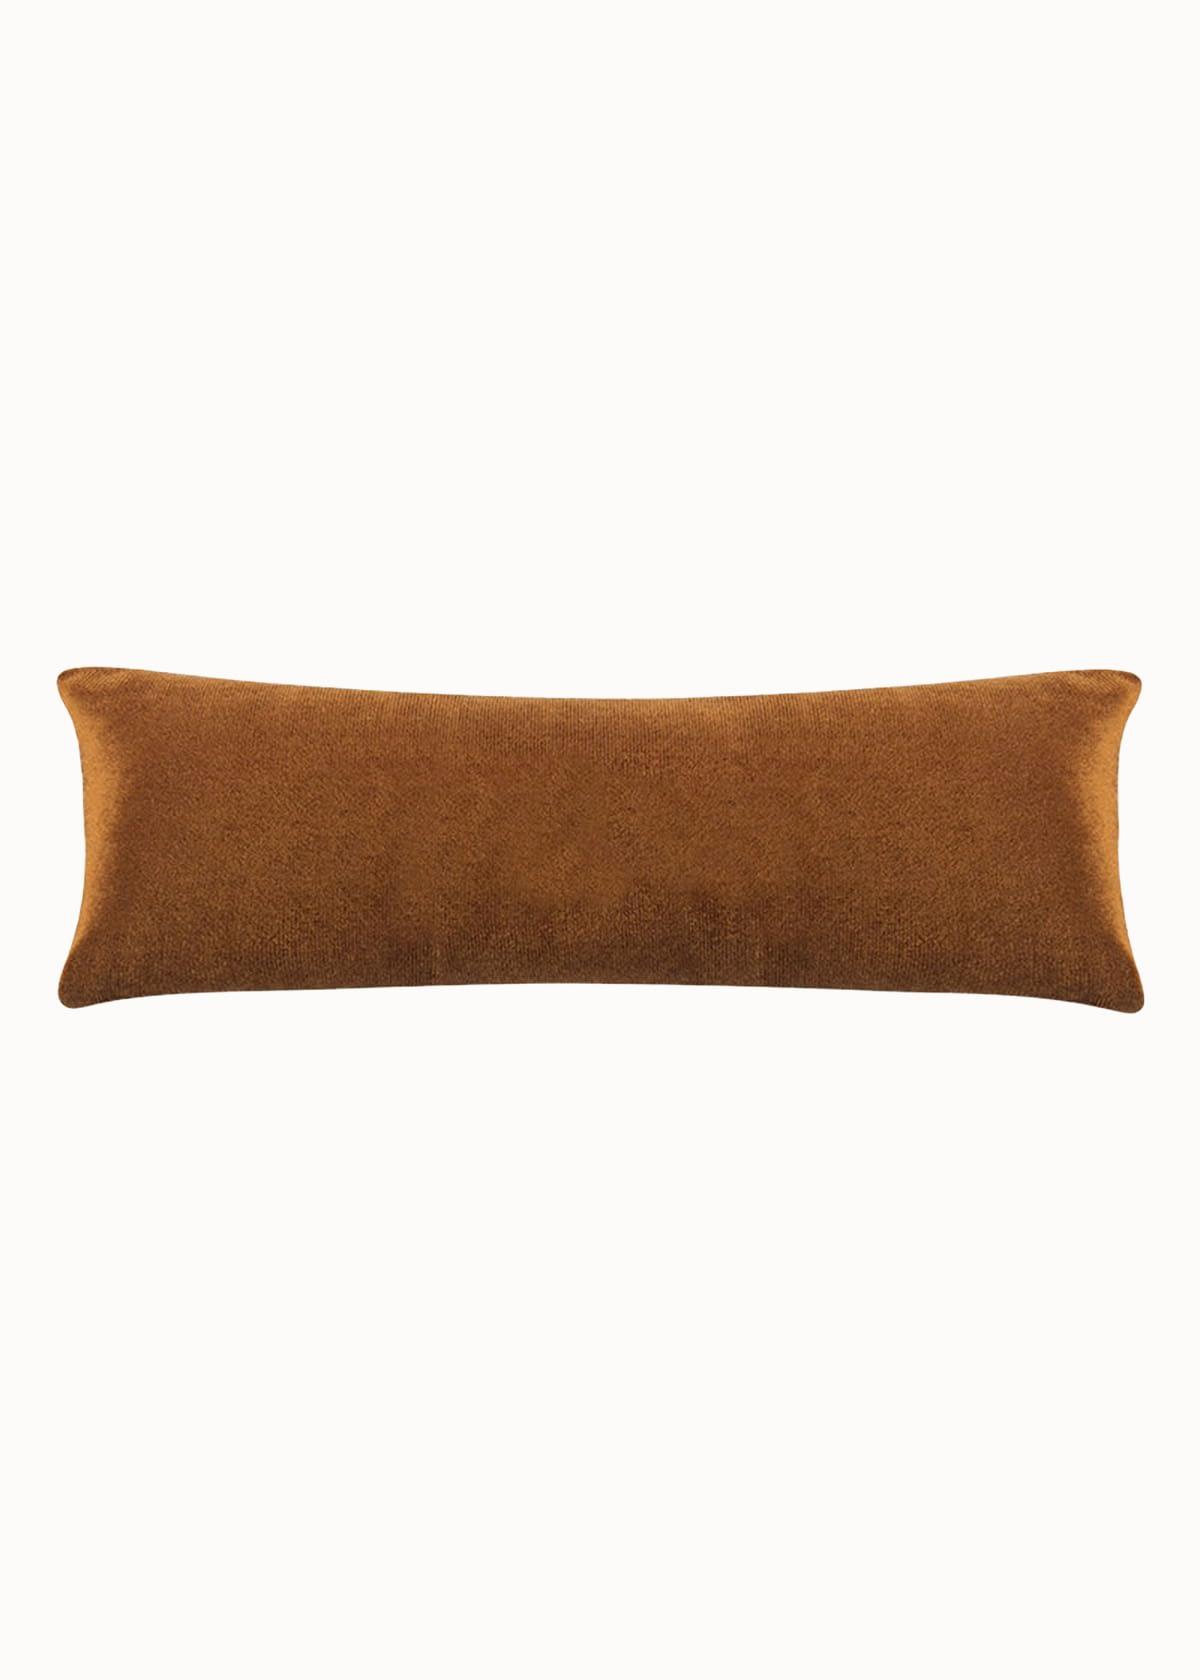 Display armbanden bruin